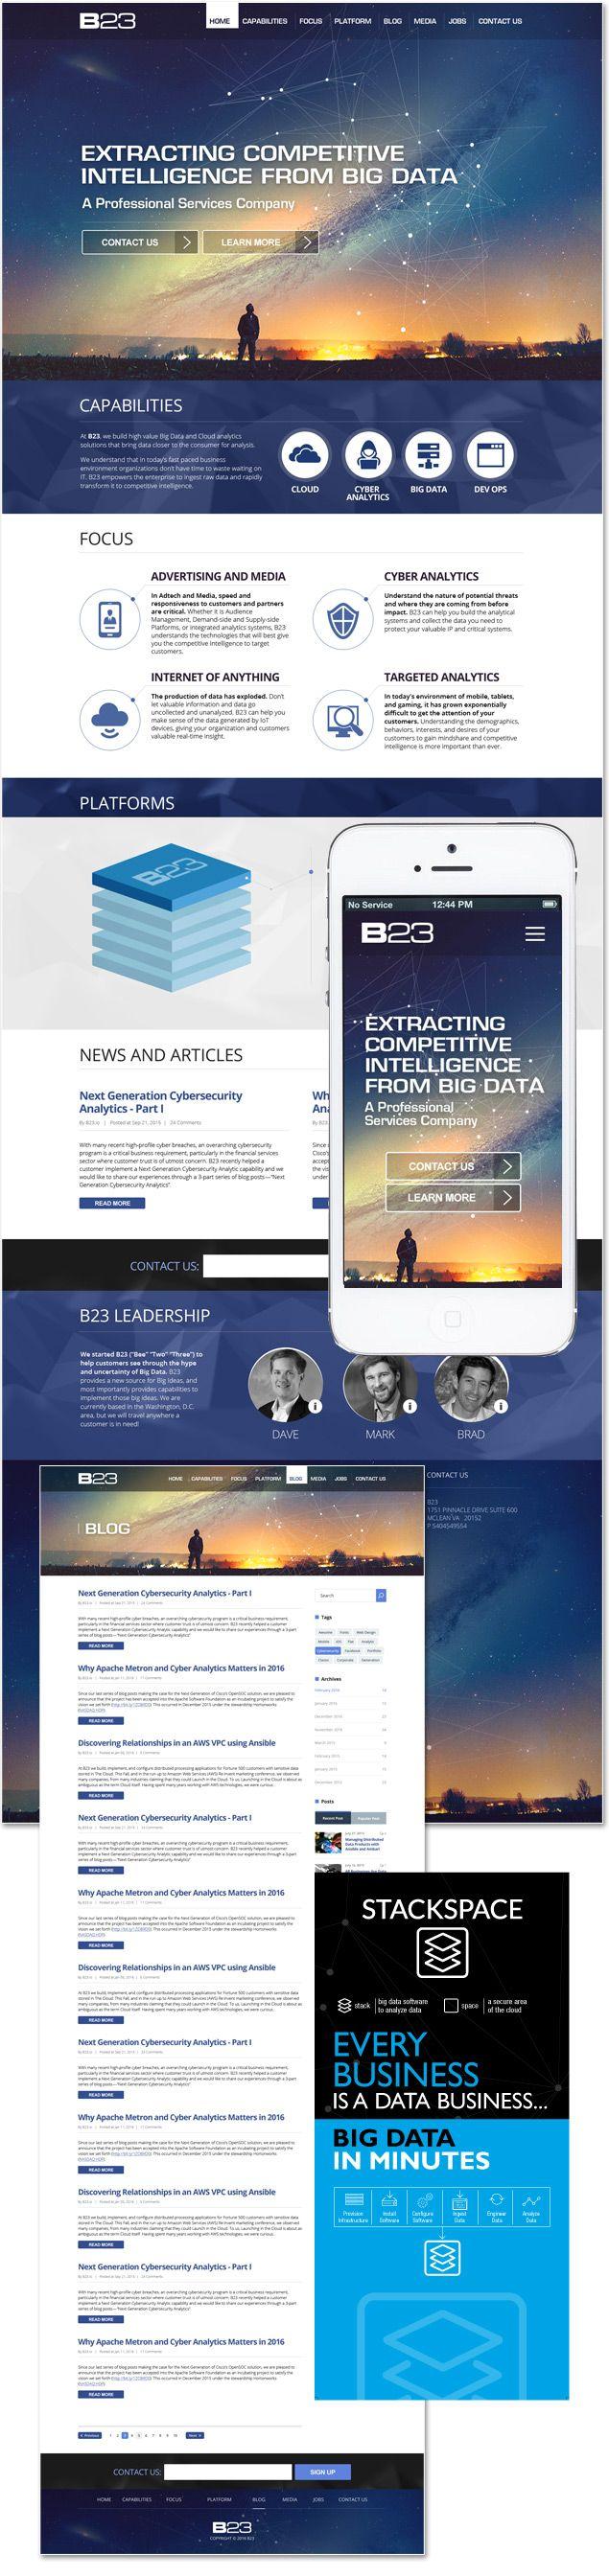 IT consulting website design | Interact | Pinterest | Website ...